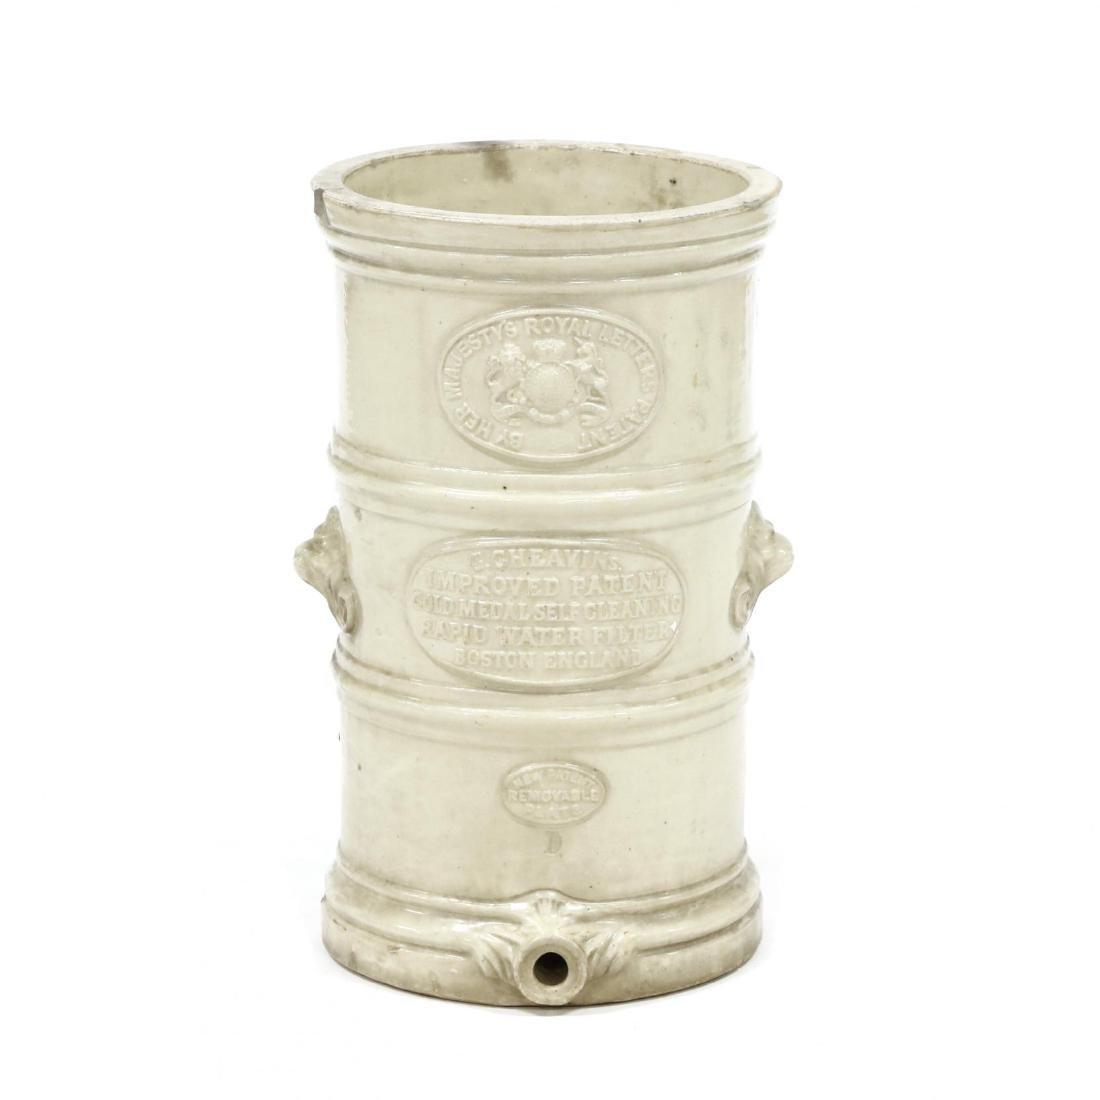 G. Cheavins, Antique English Stoneware Water Filter